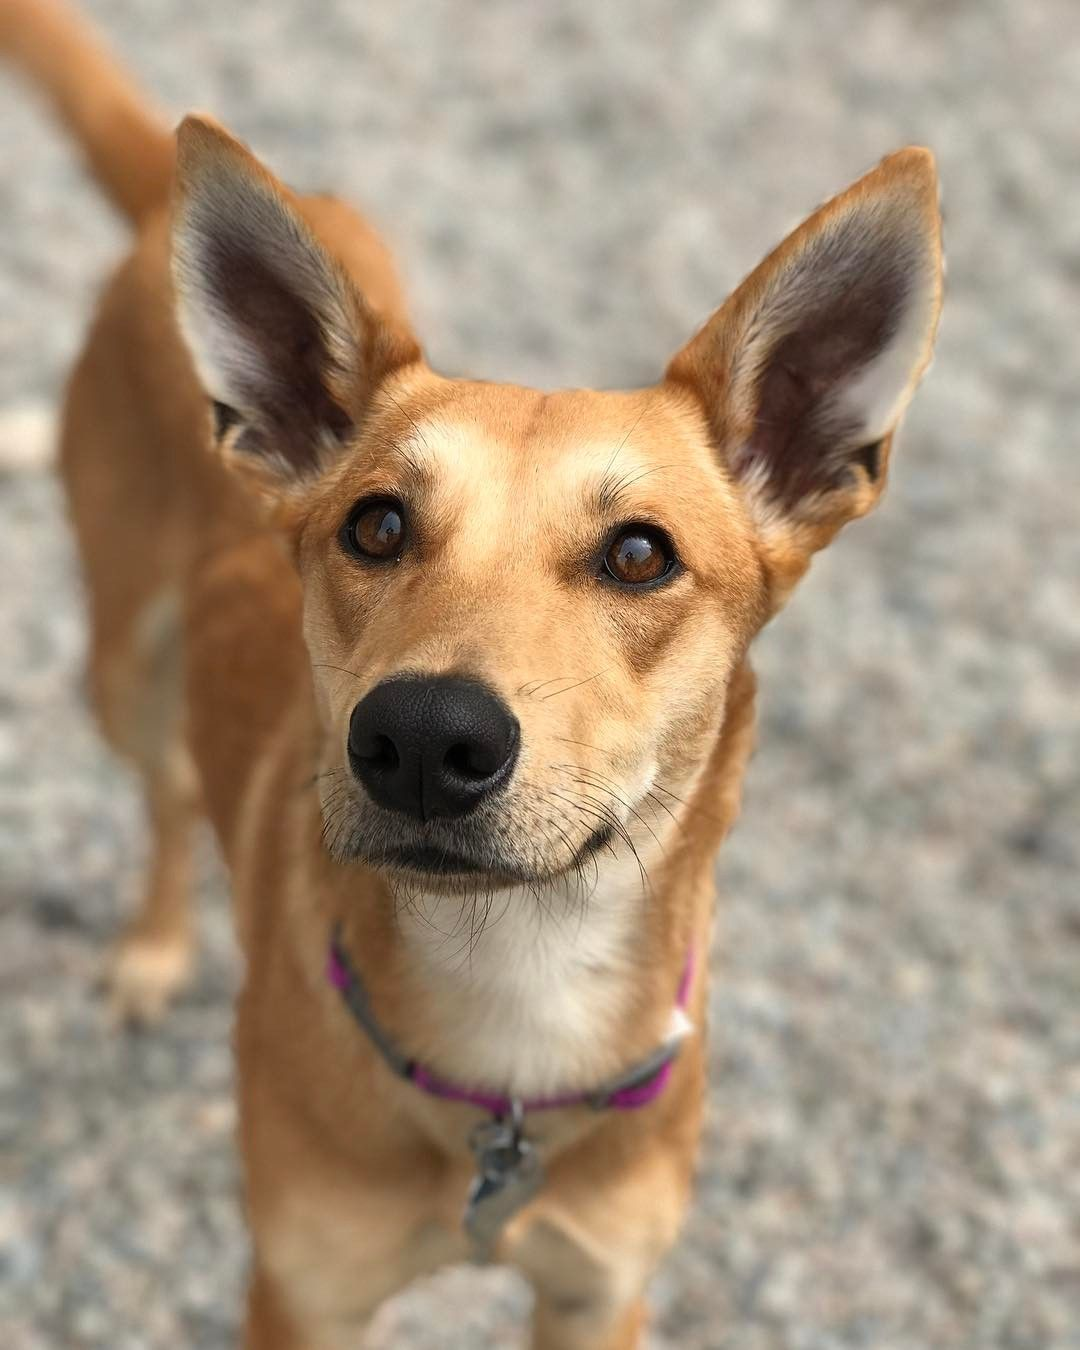 Foster 3! Up dog, Instagram, Instagram posts